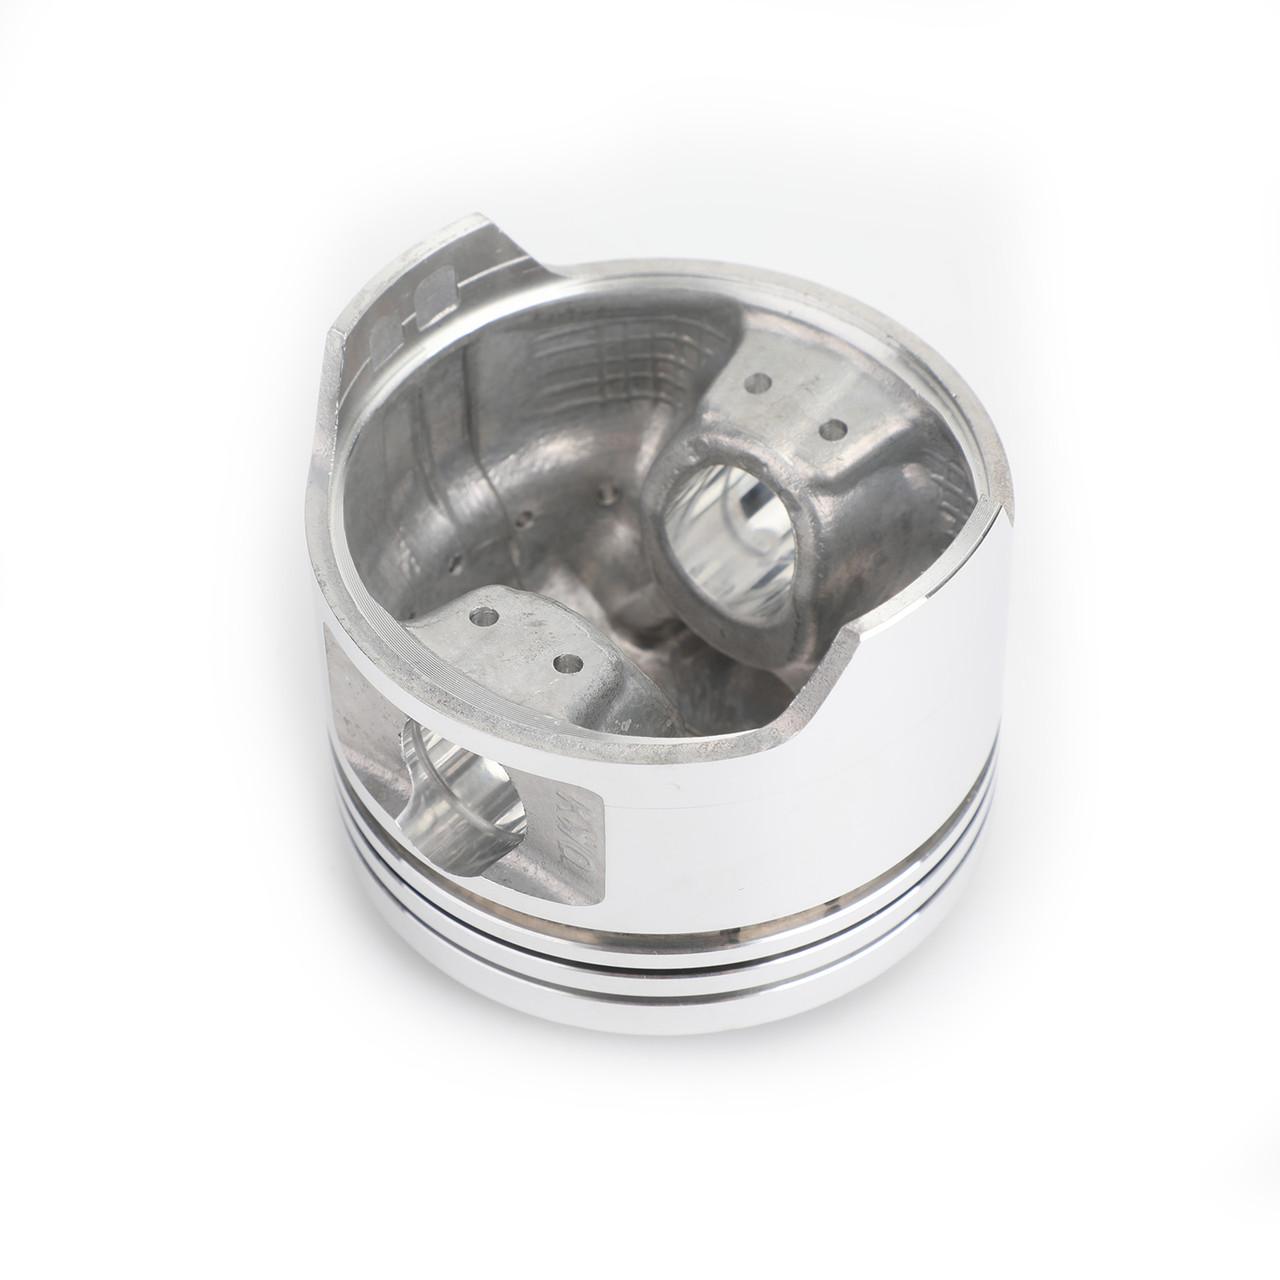 Piston Rings Pin Clips Kit 64.50mm For Honda VRX400T (NC33) 1996 NV400 CJ/CK Steed 400 92-93 NV400 CS/CV Steed 400 95-97 NT400 Bros 400 (NC25) 88-92